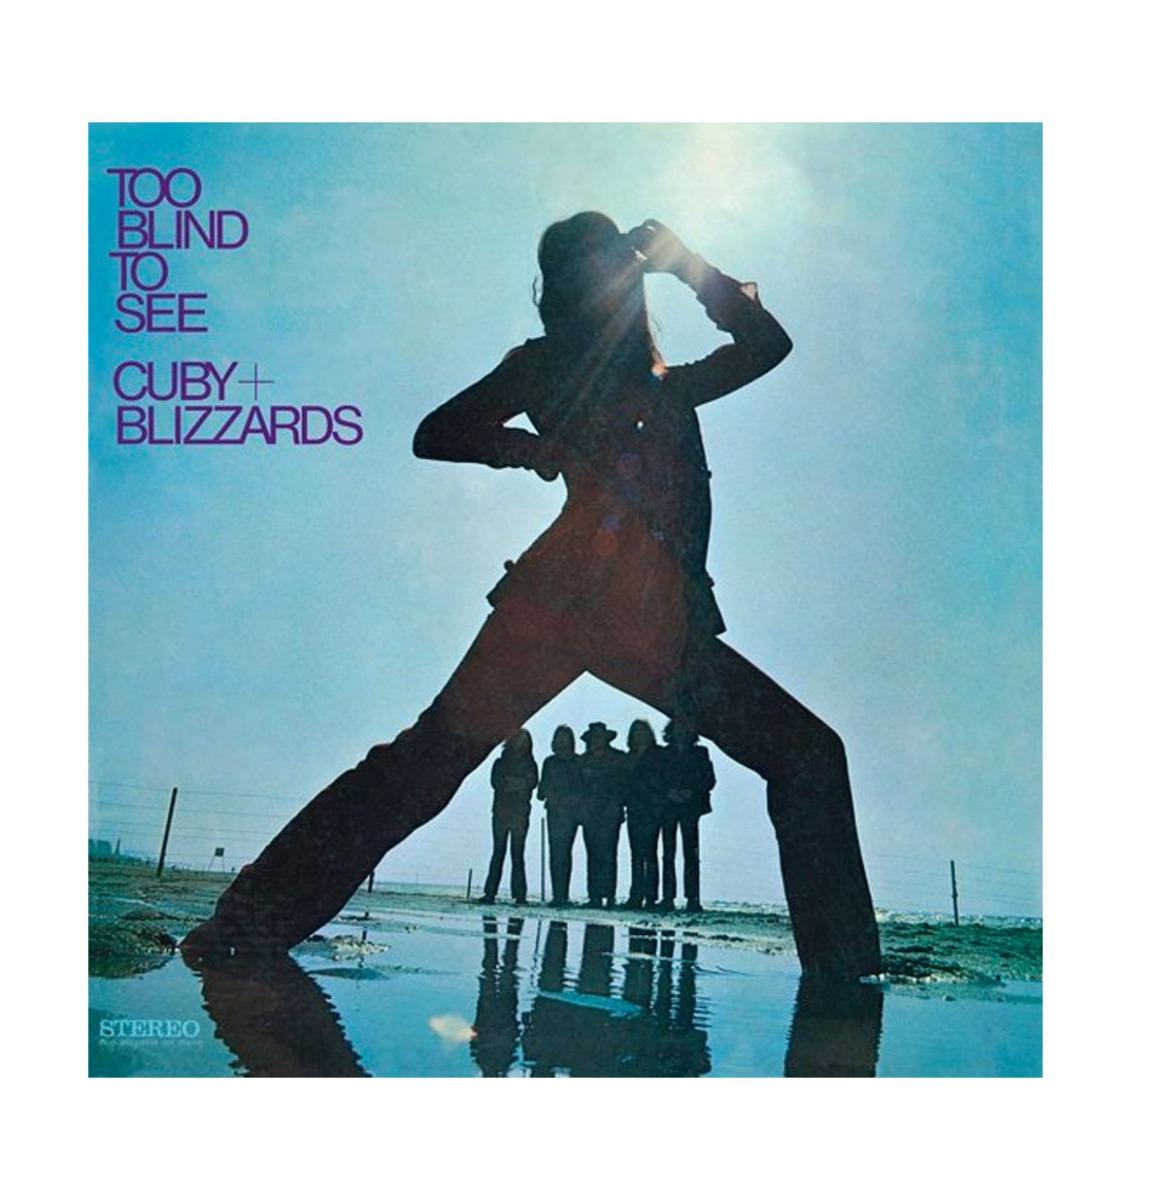 Too Blind To See - Cuby + Blizzards Beperkte Oplage Paars Vinyl